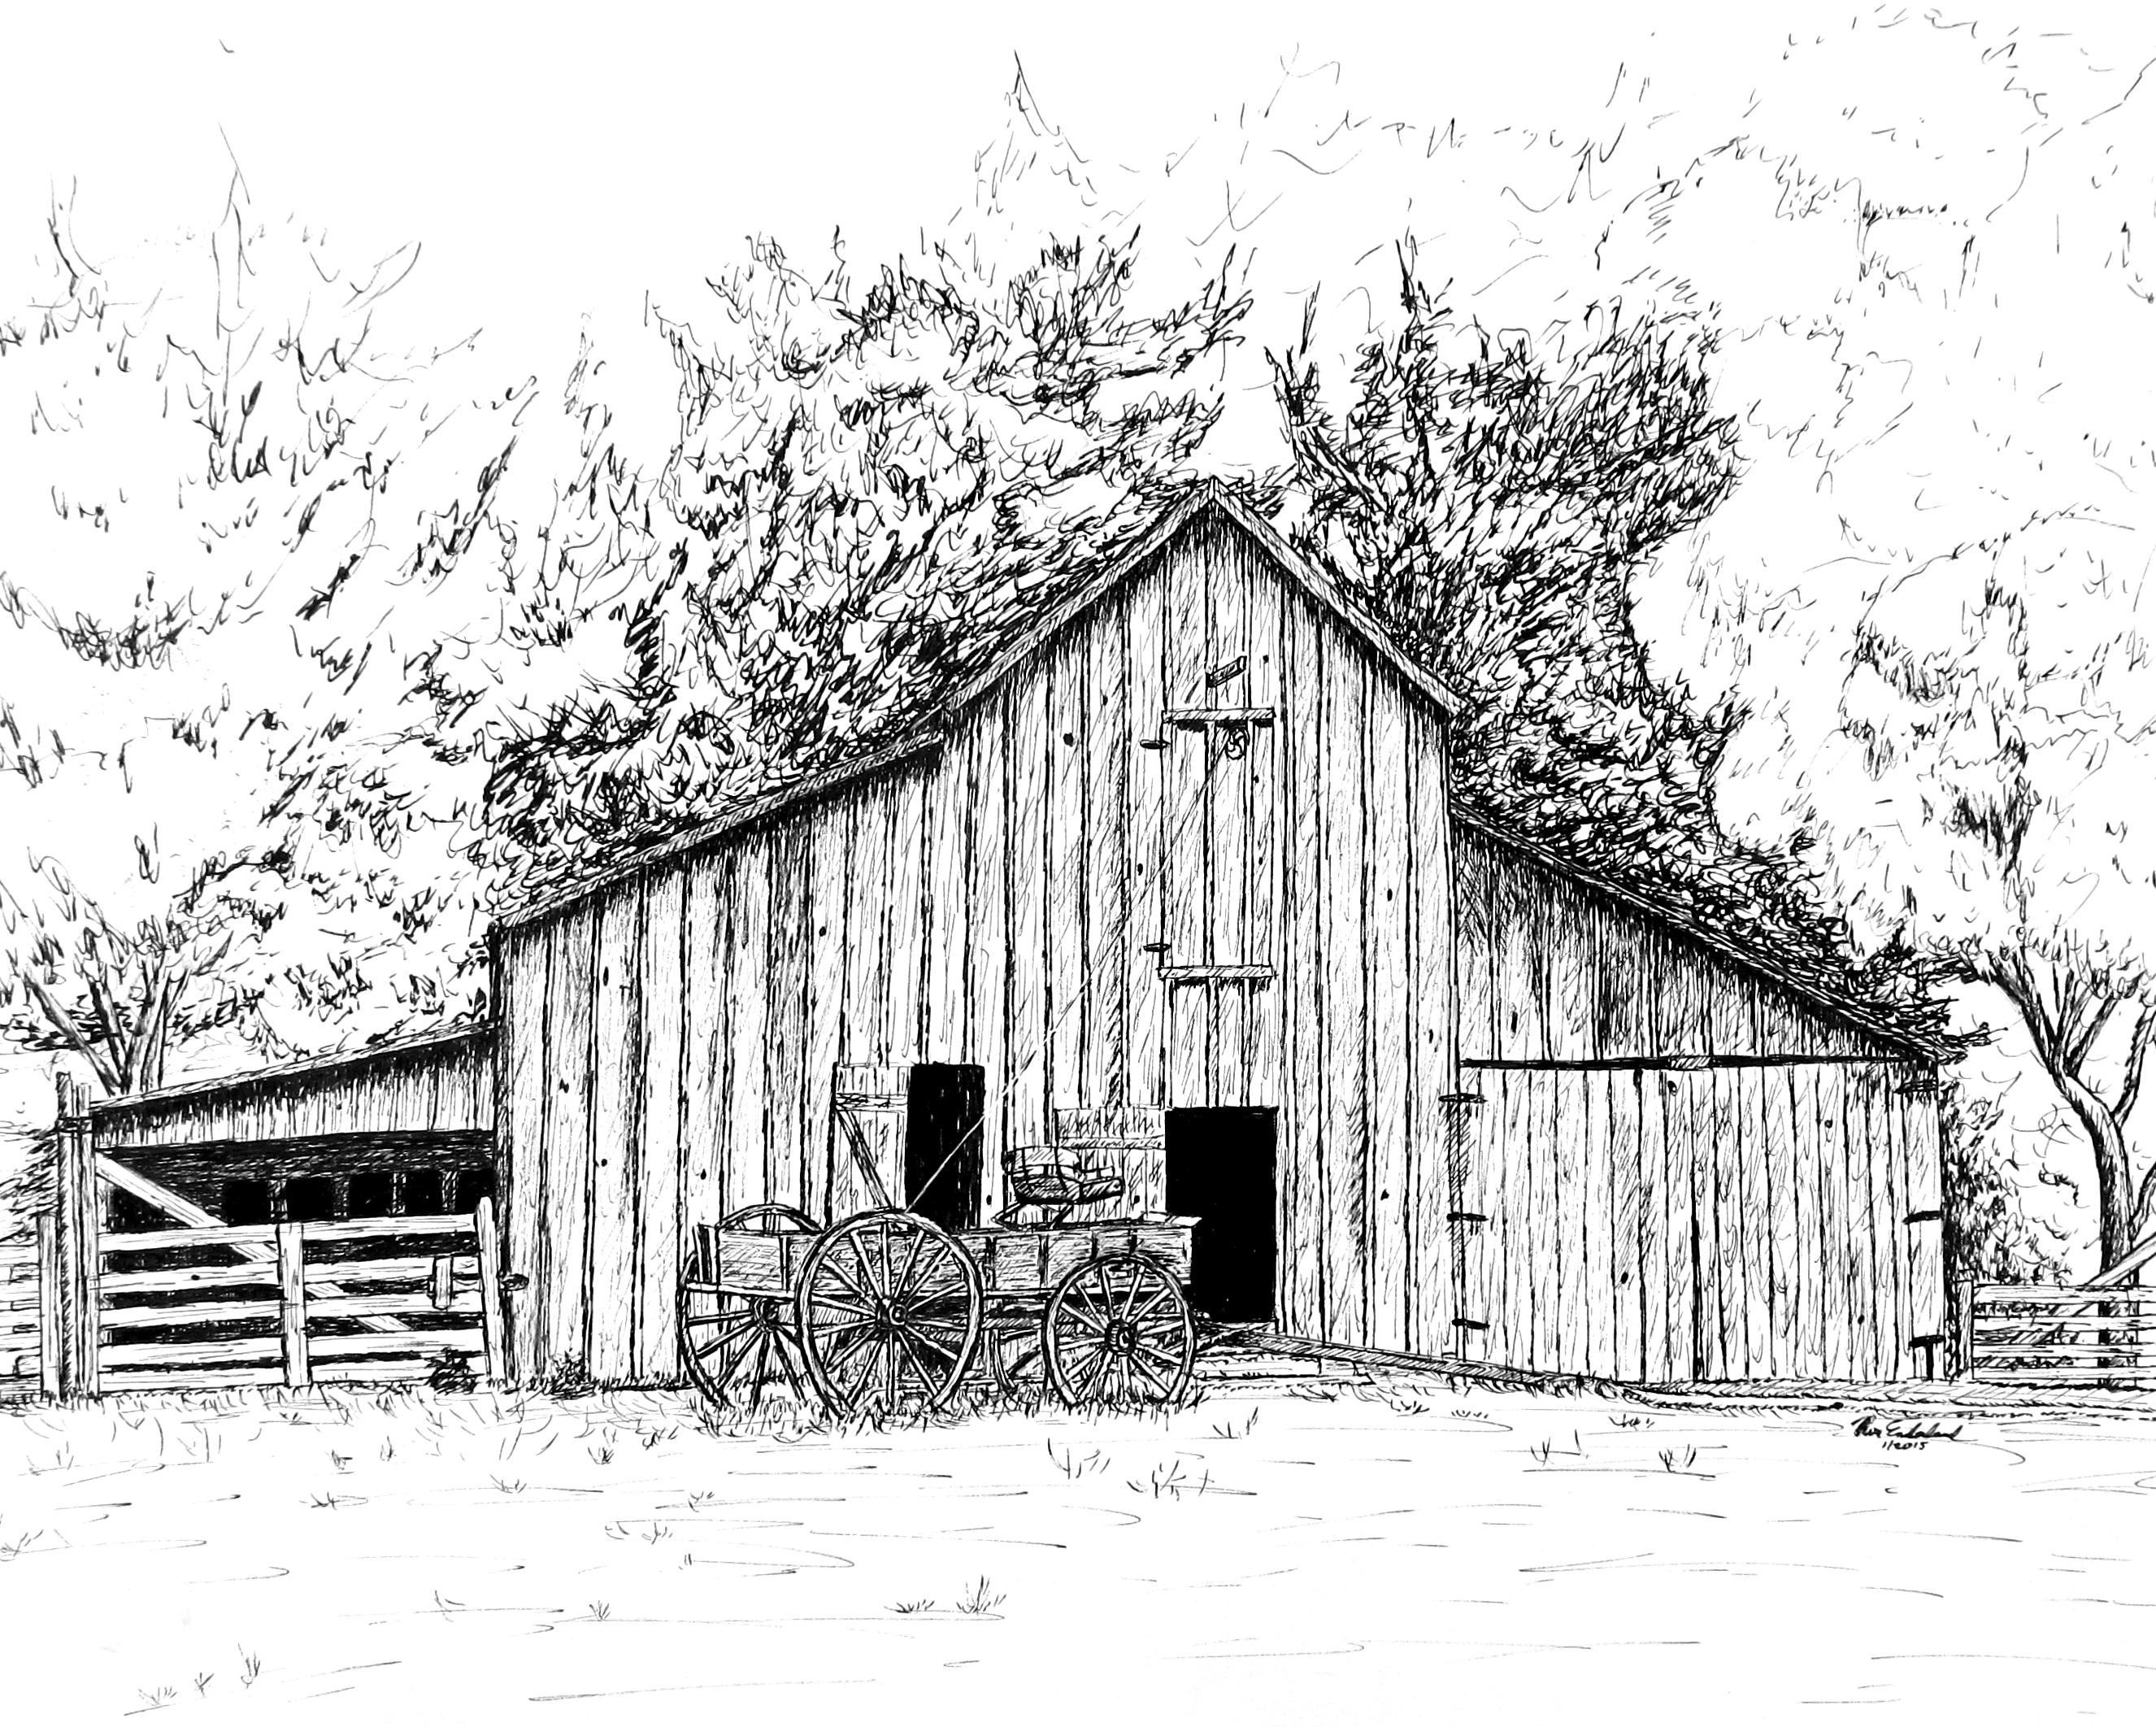 Barn with Wagon